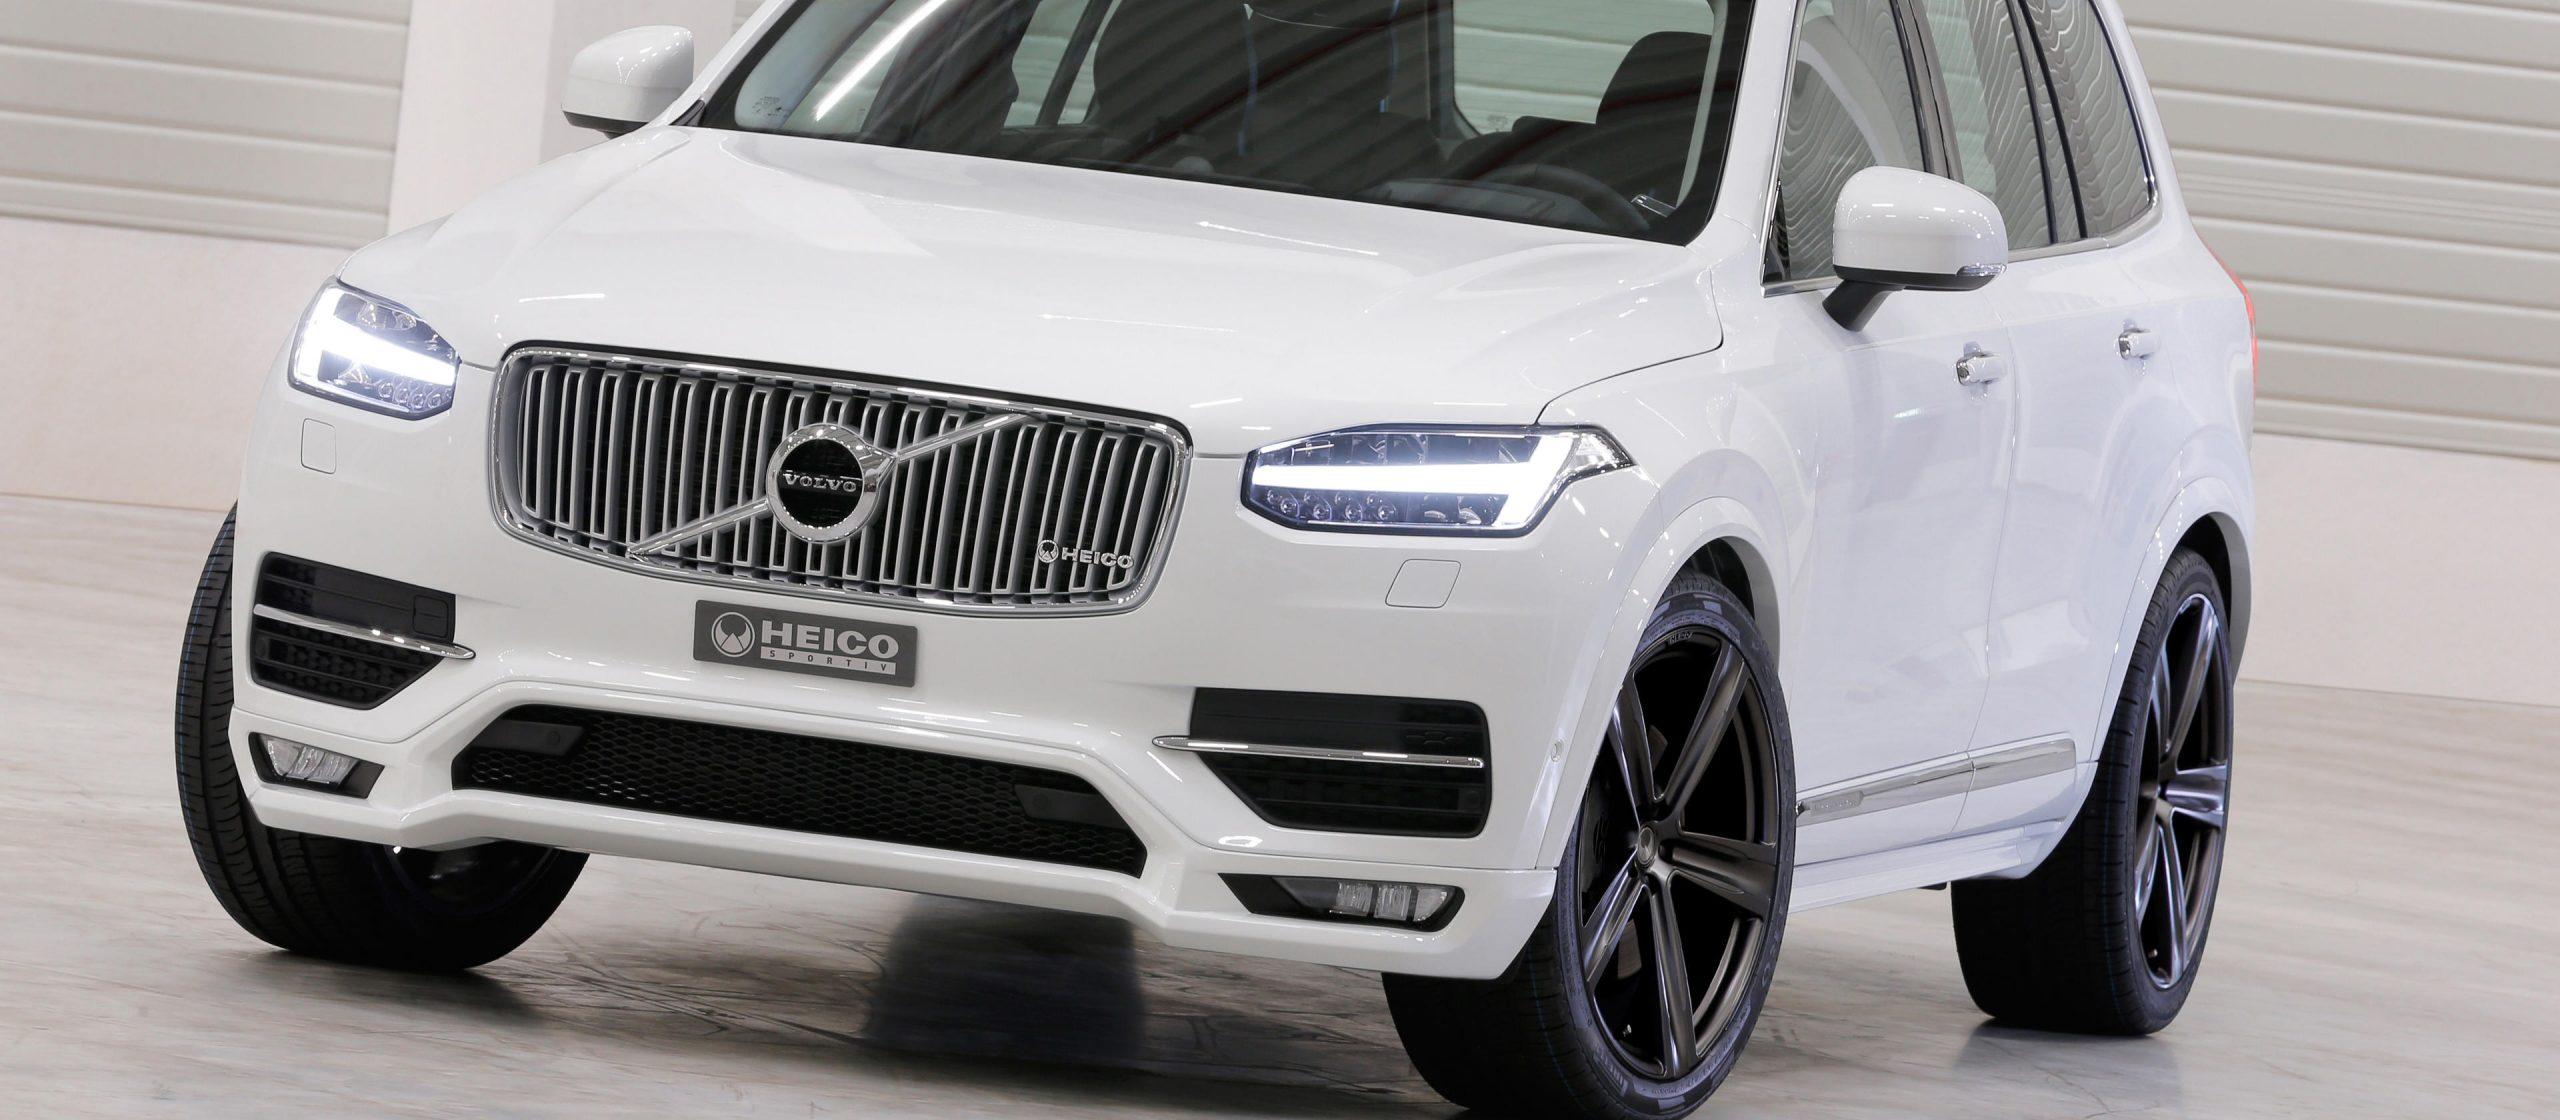 heico-sportiv-volvo-xc90-256-alloy-wheel-volution-five-2-titanium-matt-front-scrubber